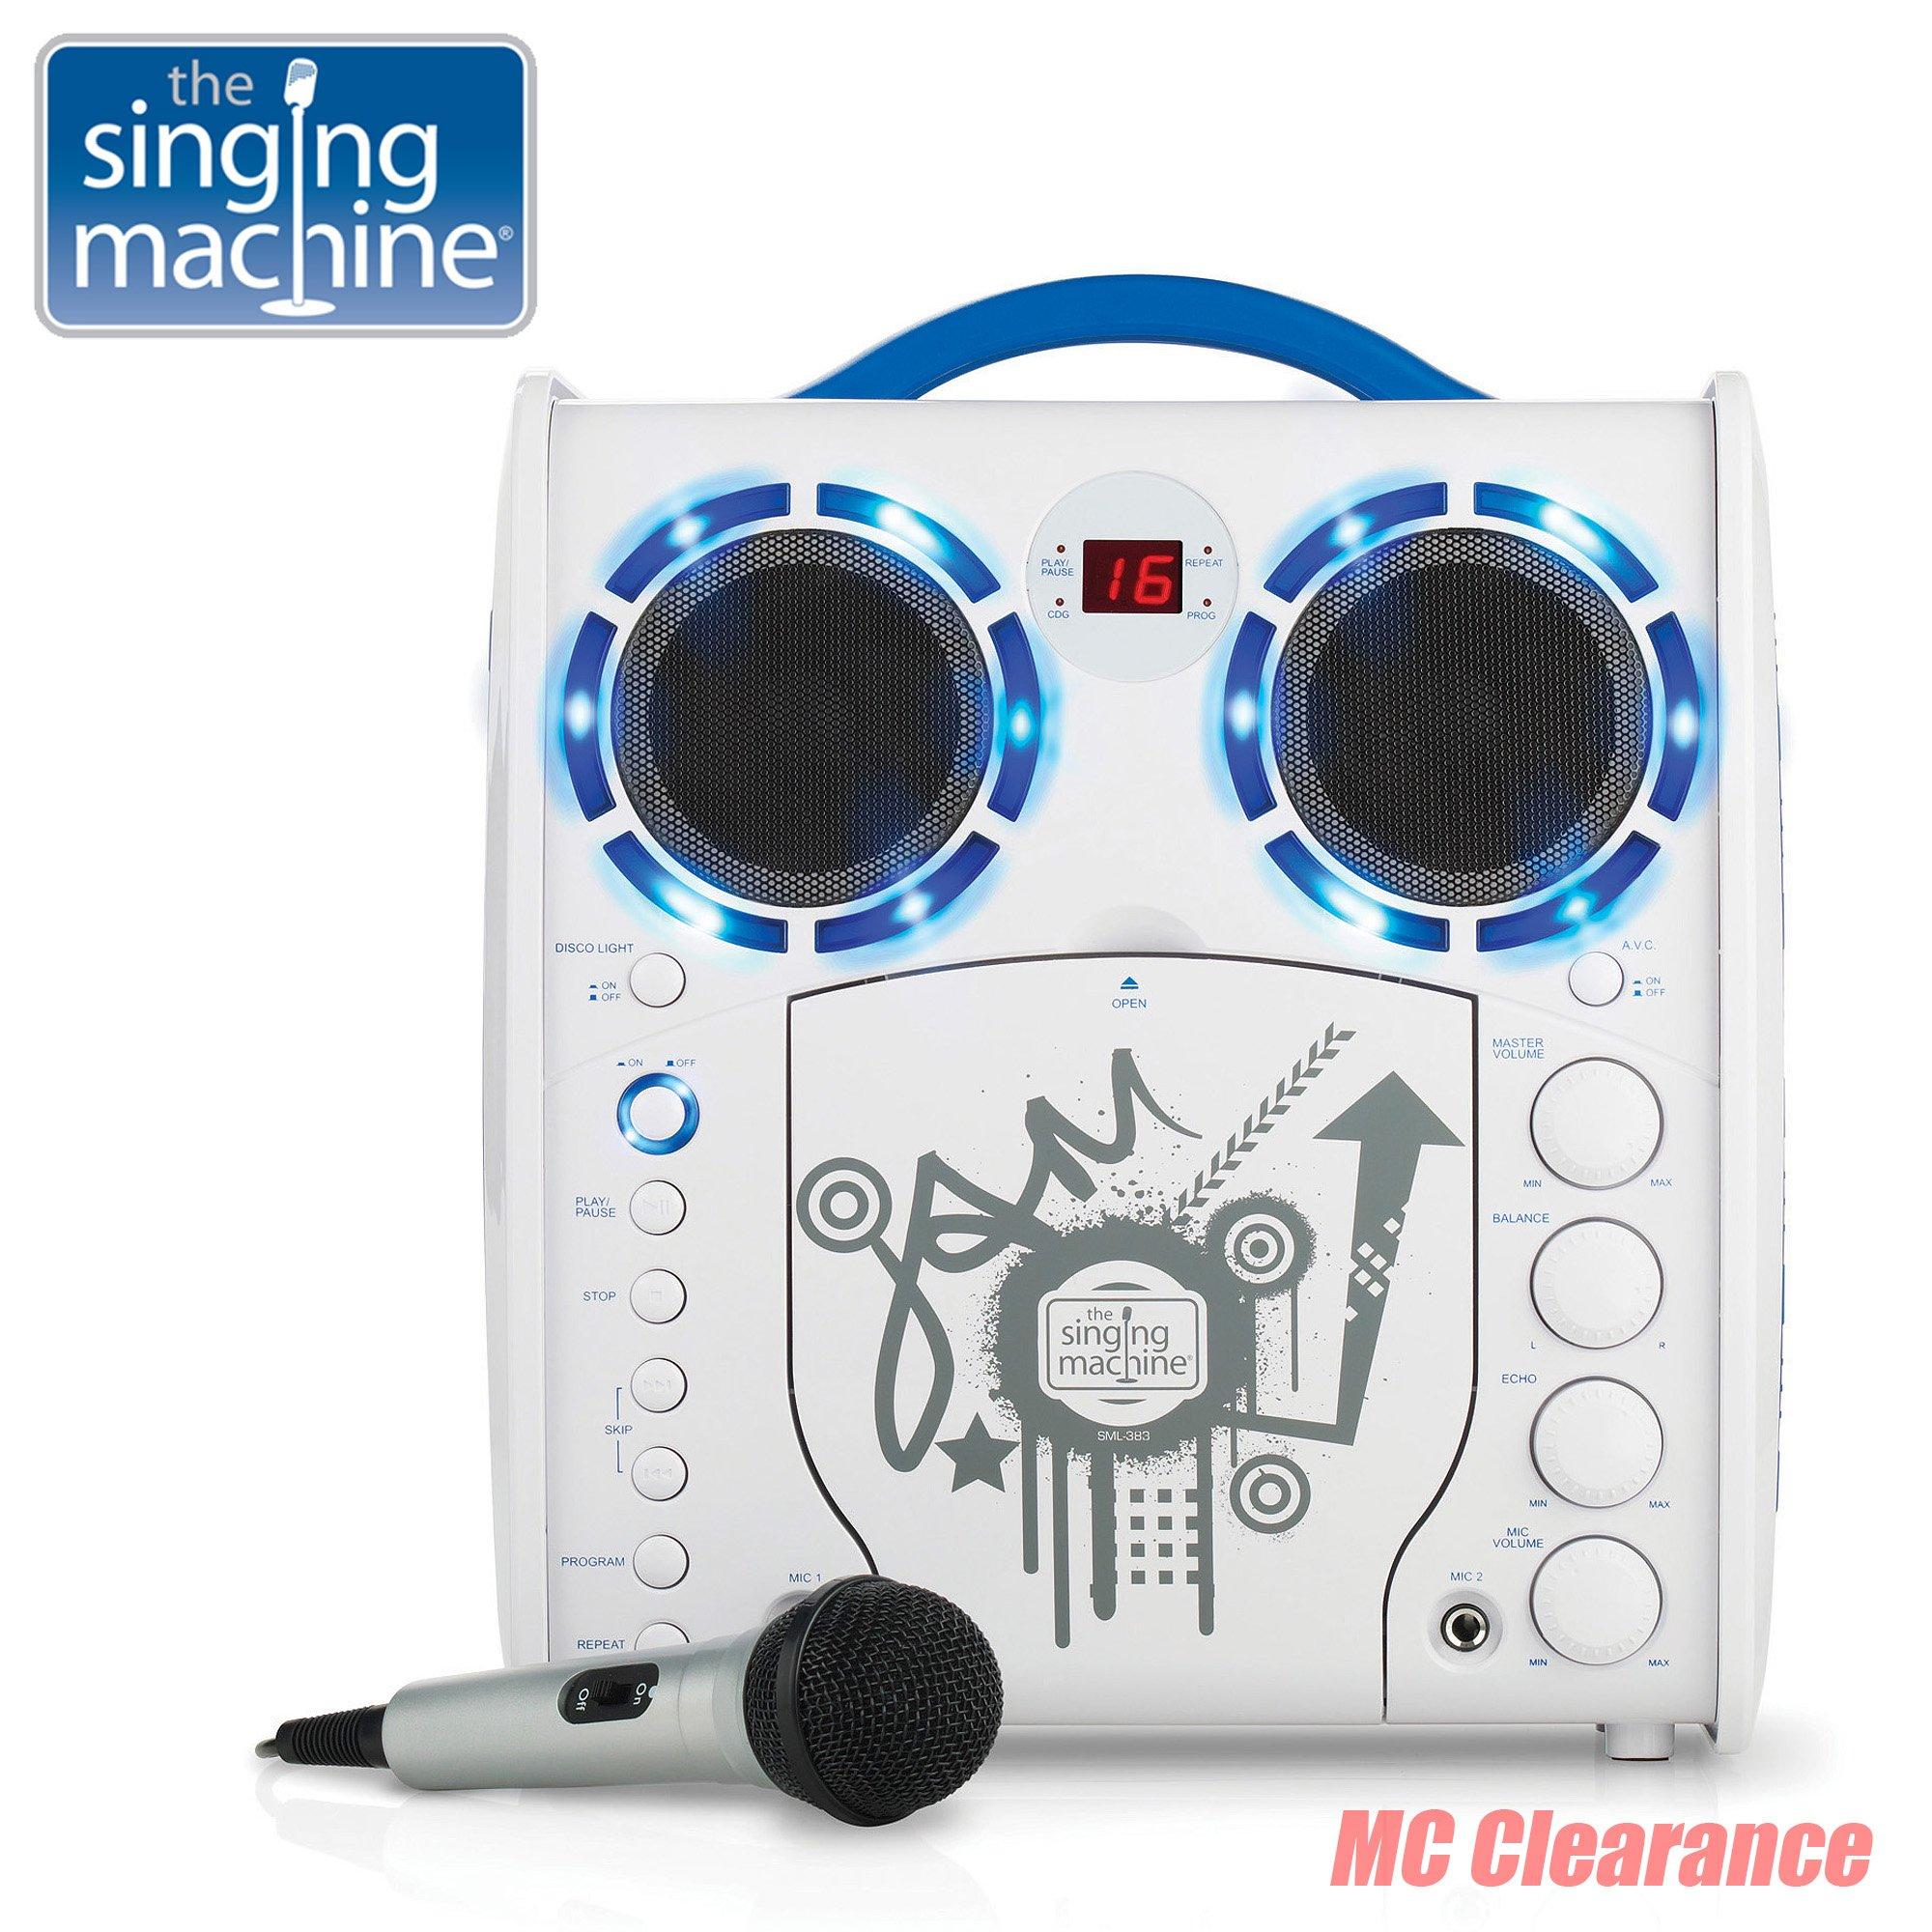 Portable Karaoke CD/CDG Player Singing Machine SML-383YB Limited Edition, Youth Blue (Refurbished)